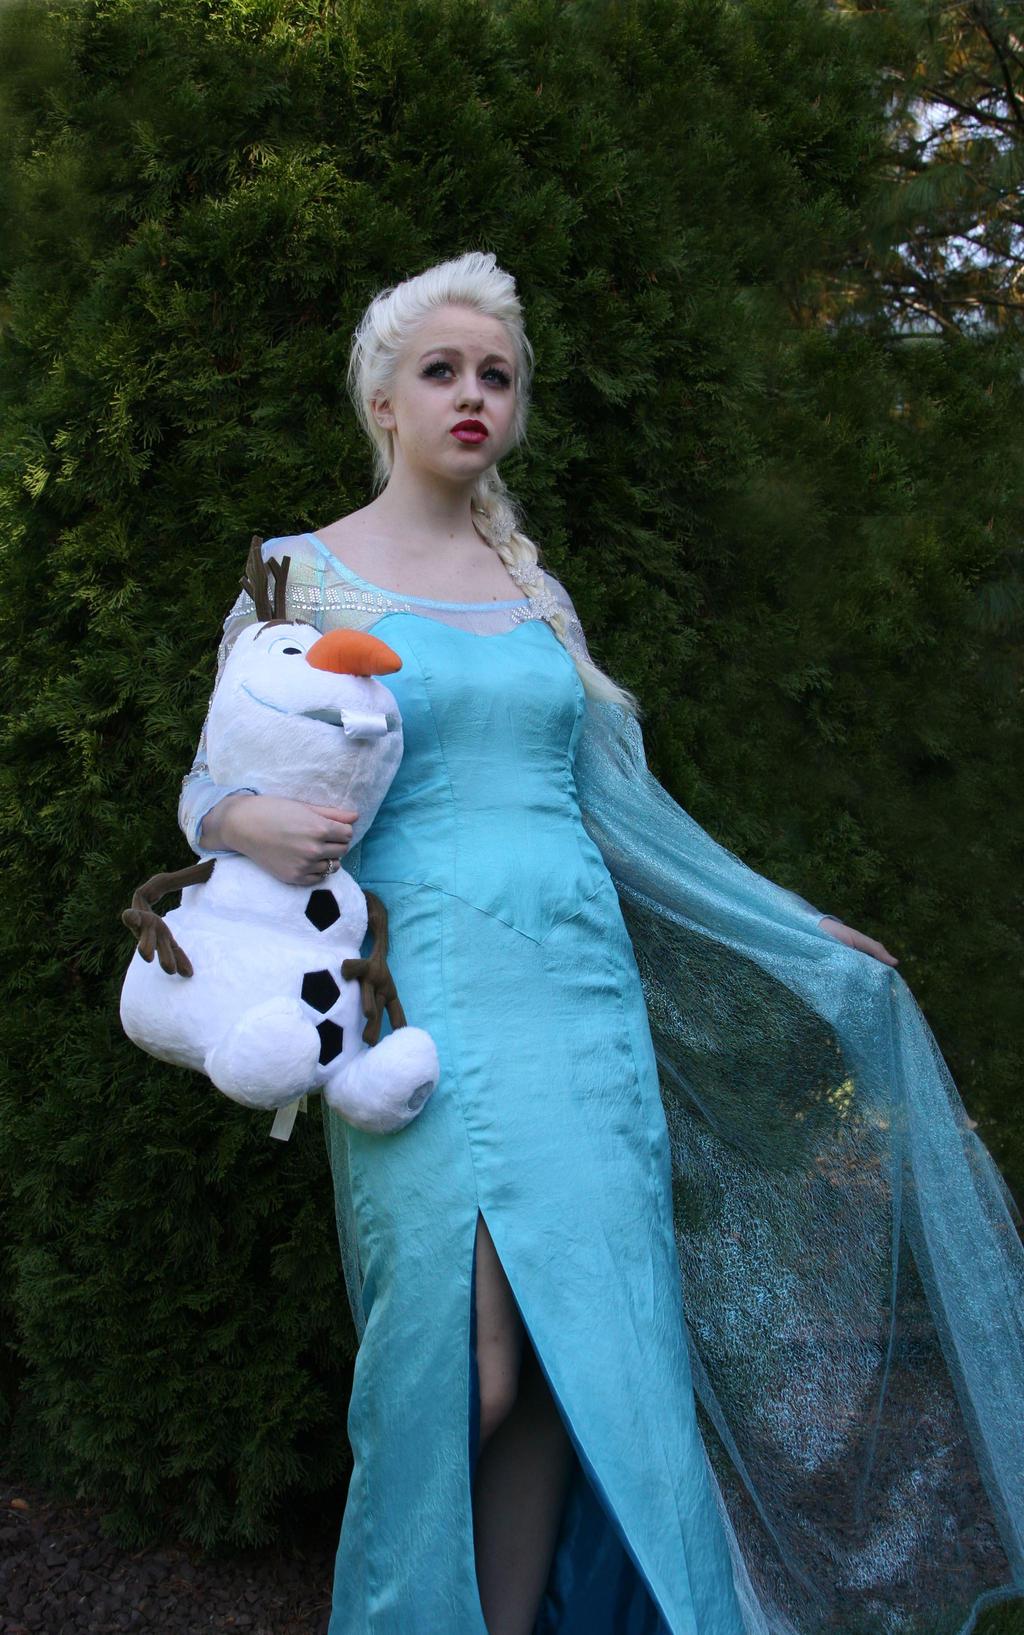 Elsa Cosplay - 2 by ashleyMO on DeviantArt